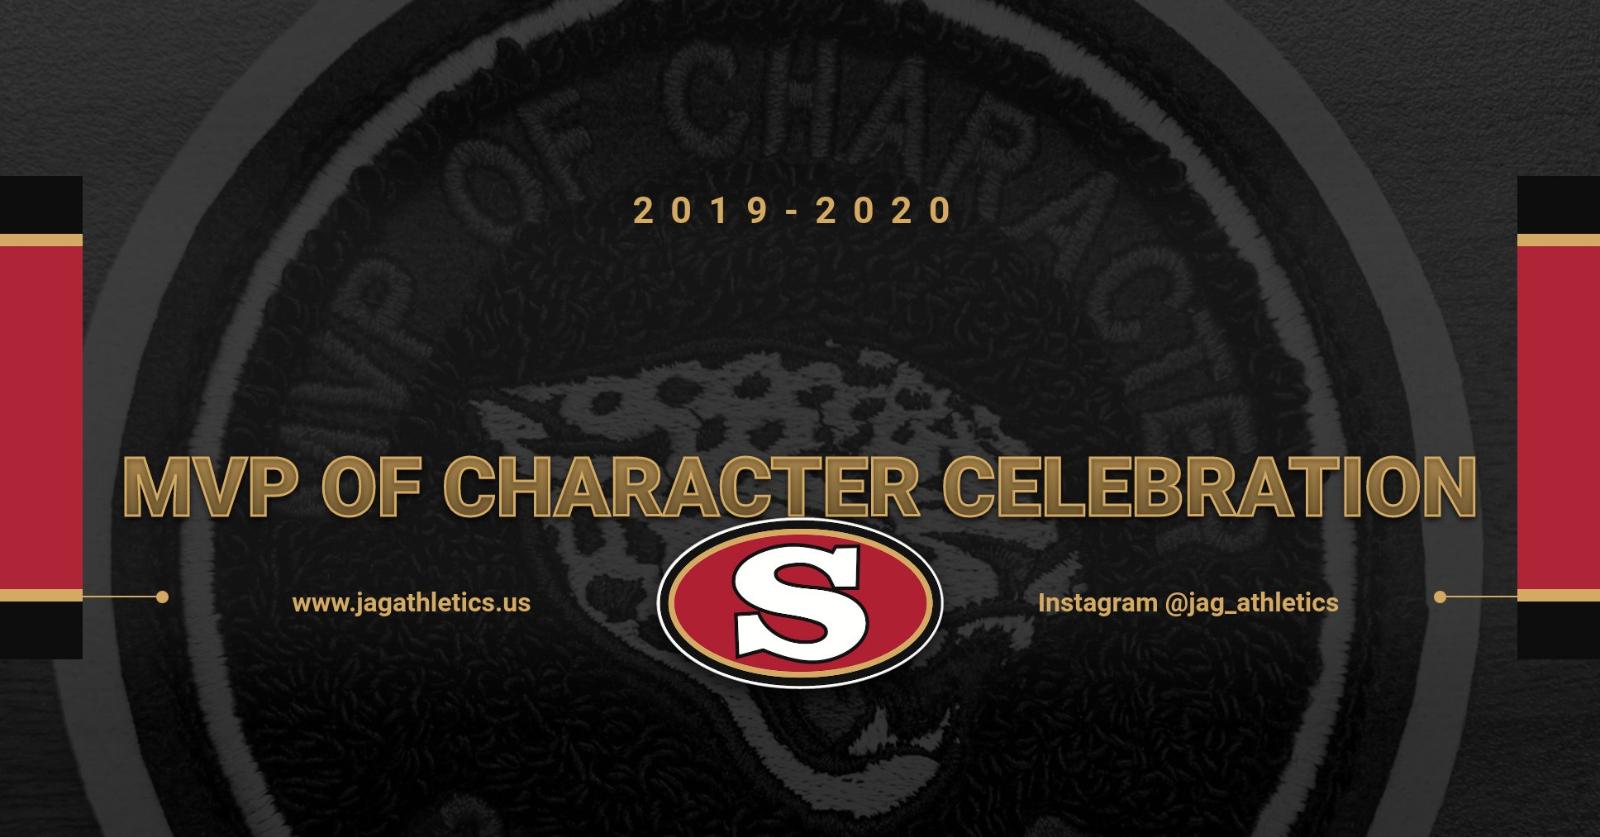 2019-2020 MVP's of Character